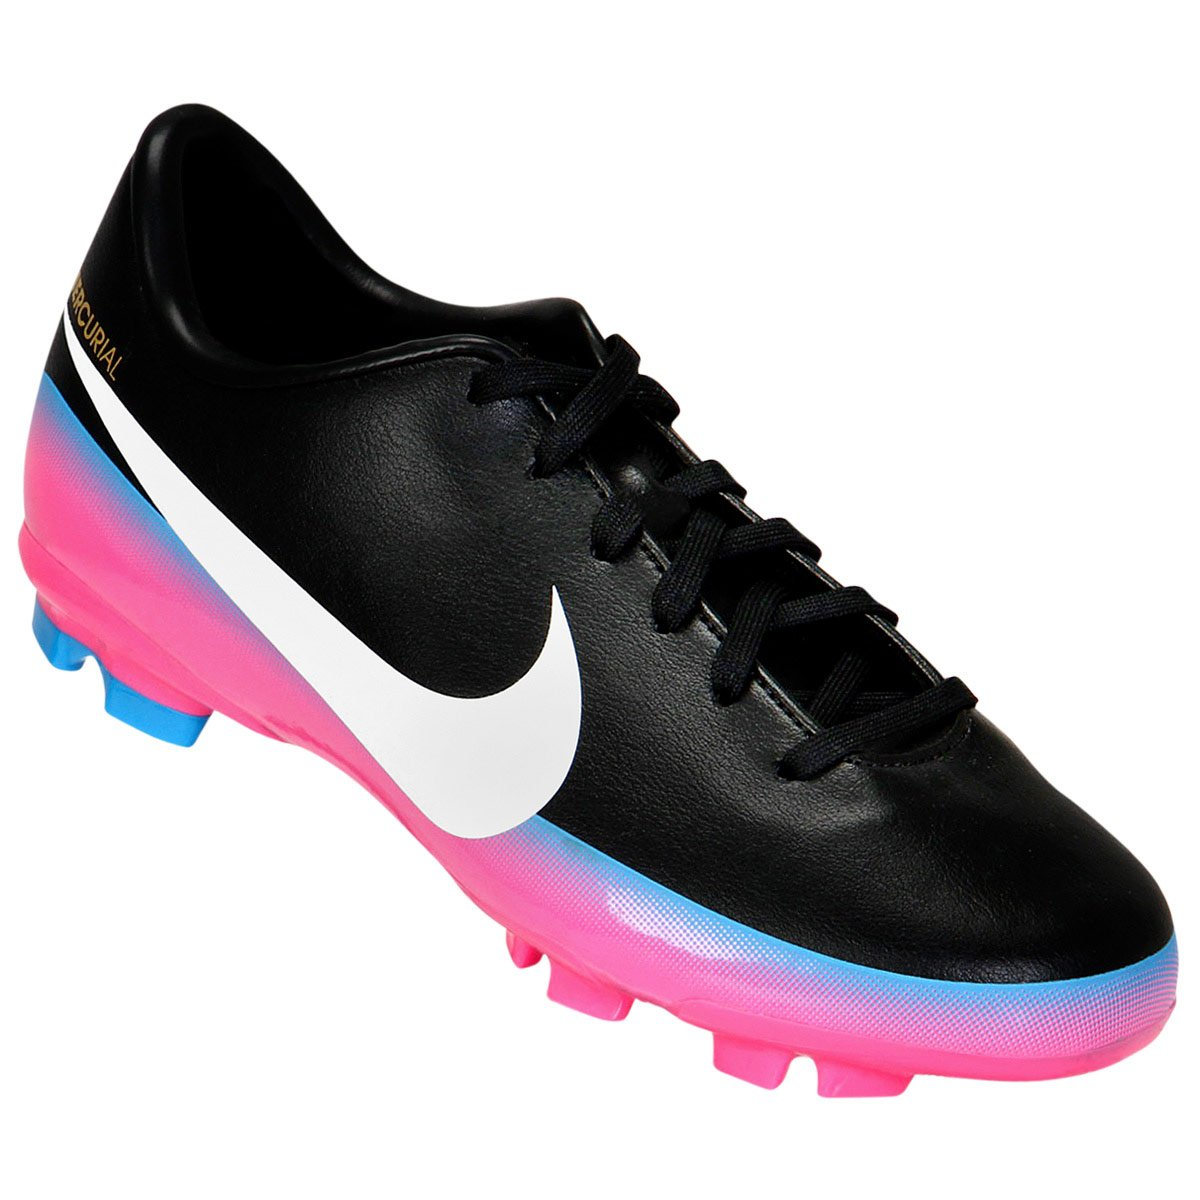 Chuteira Nike Mercurial Victory 3 Cr7 Fg  2a0c61dc2e63e